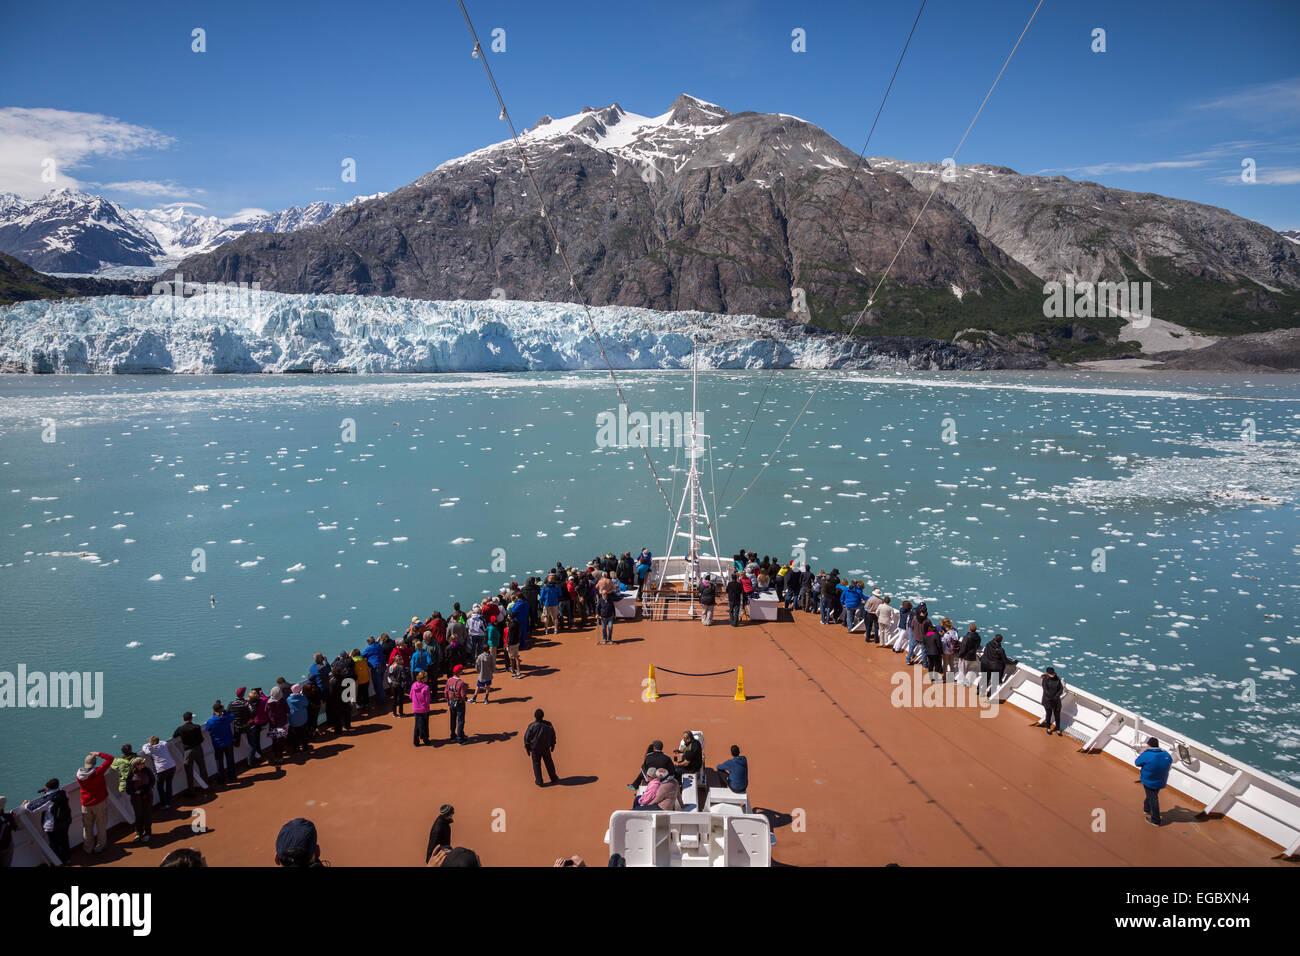 Bow of cruise ship in Glacier Bay, Alaska, USA, North America. - Stock Image